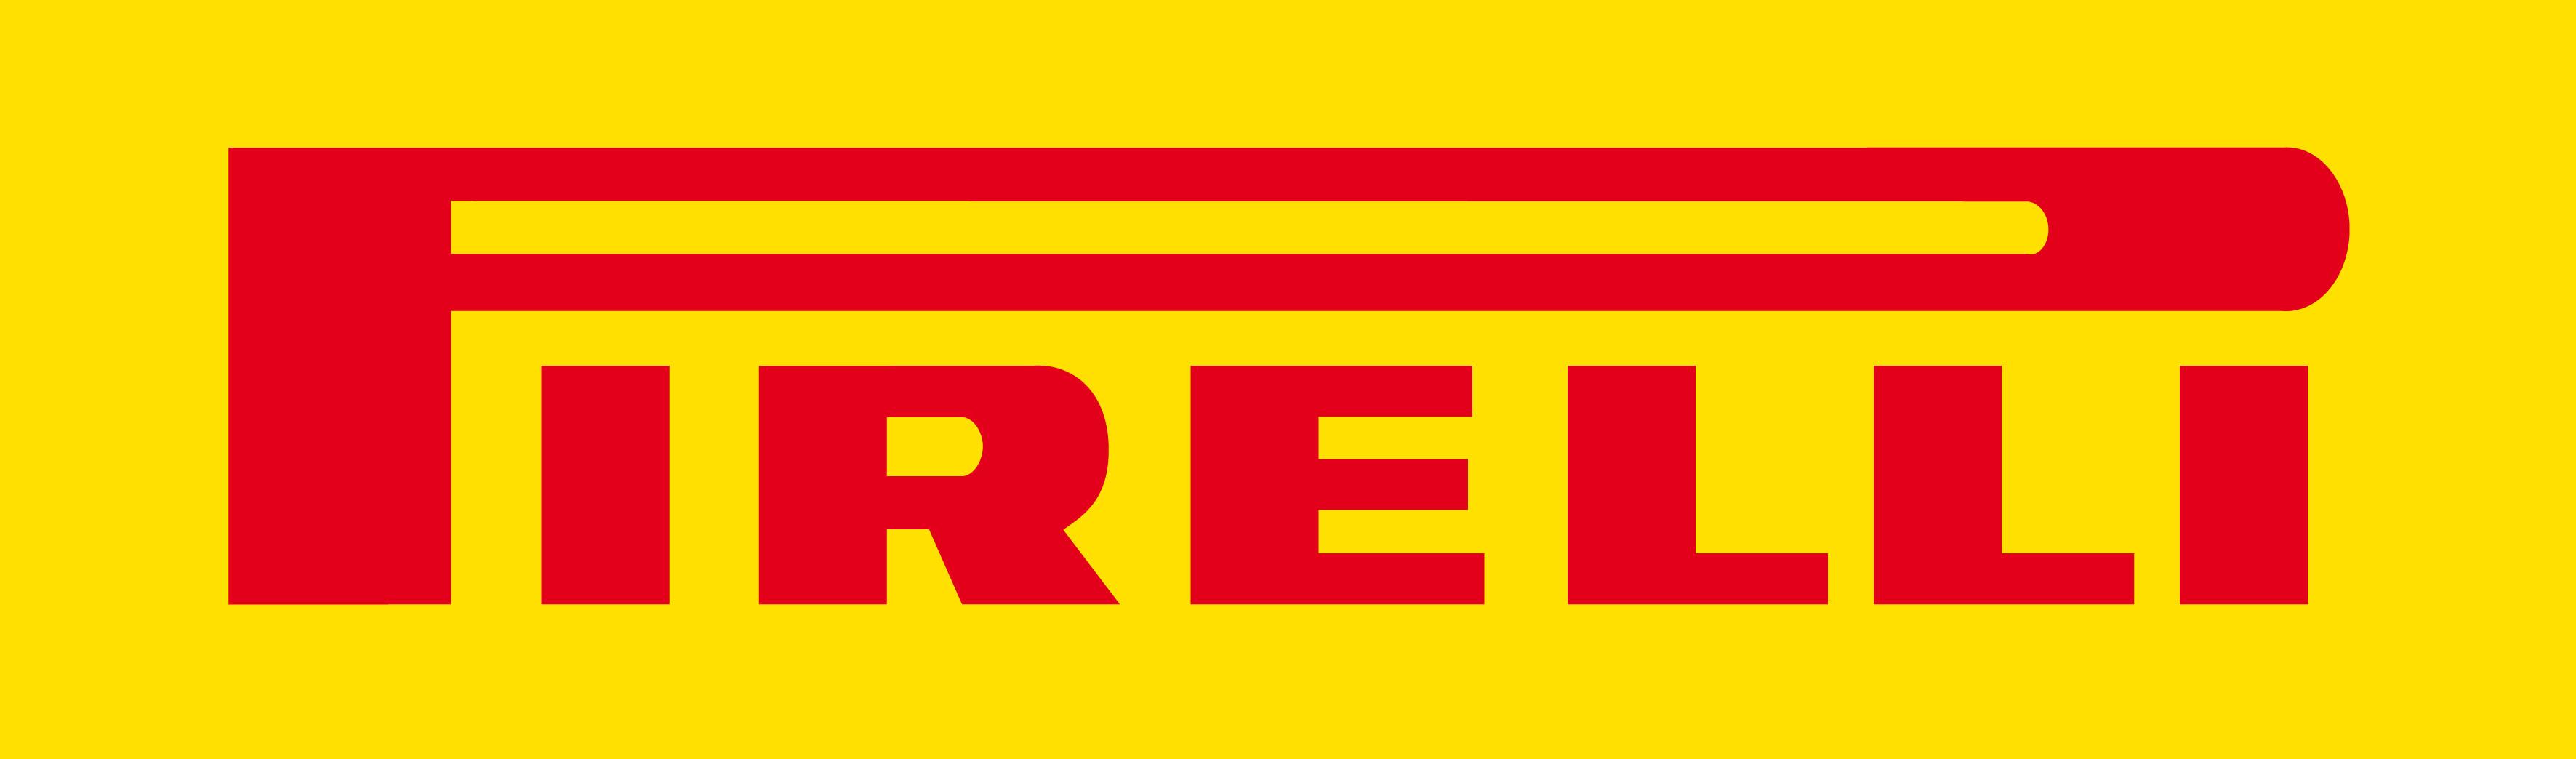 Logo pneumatik Pirelli